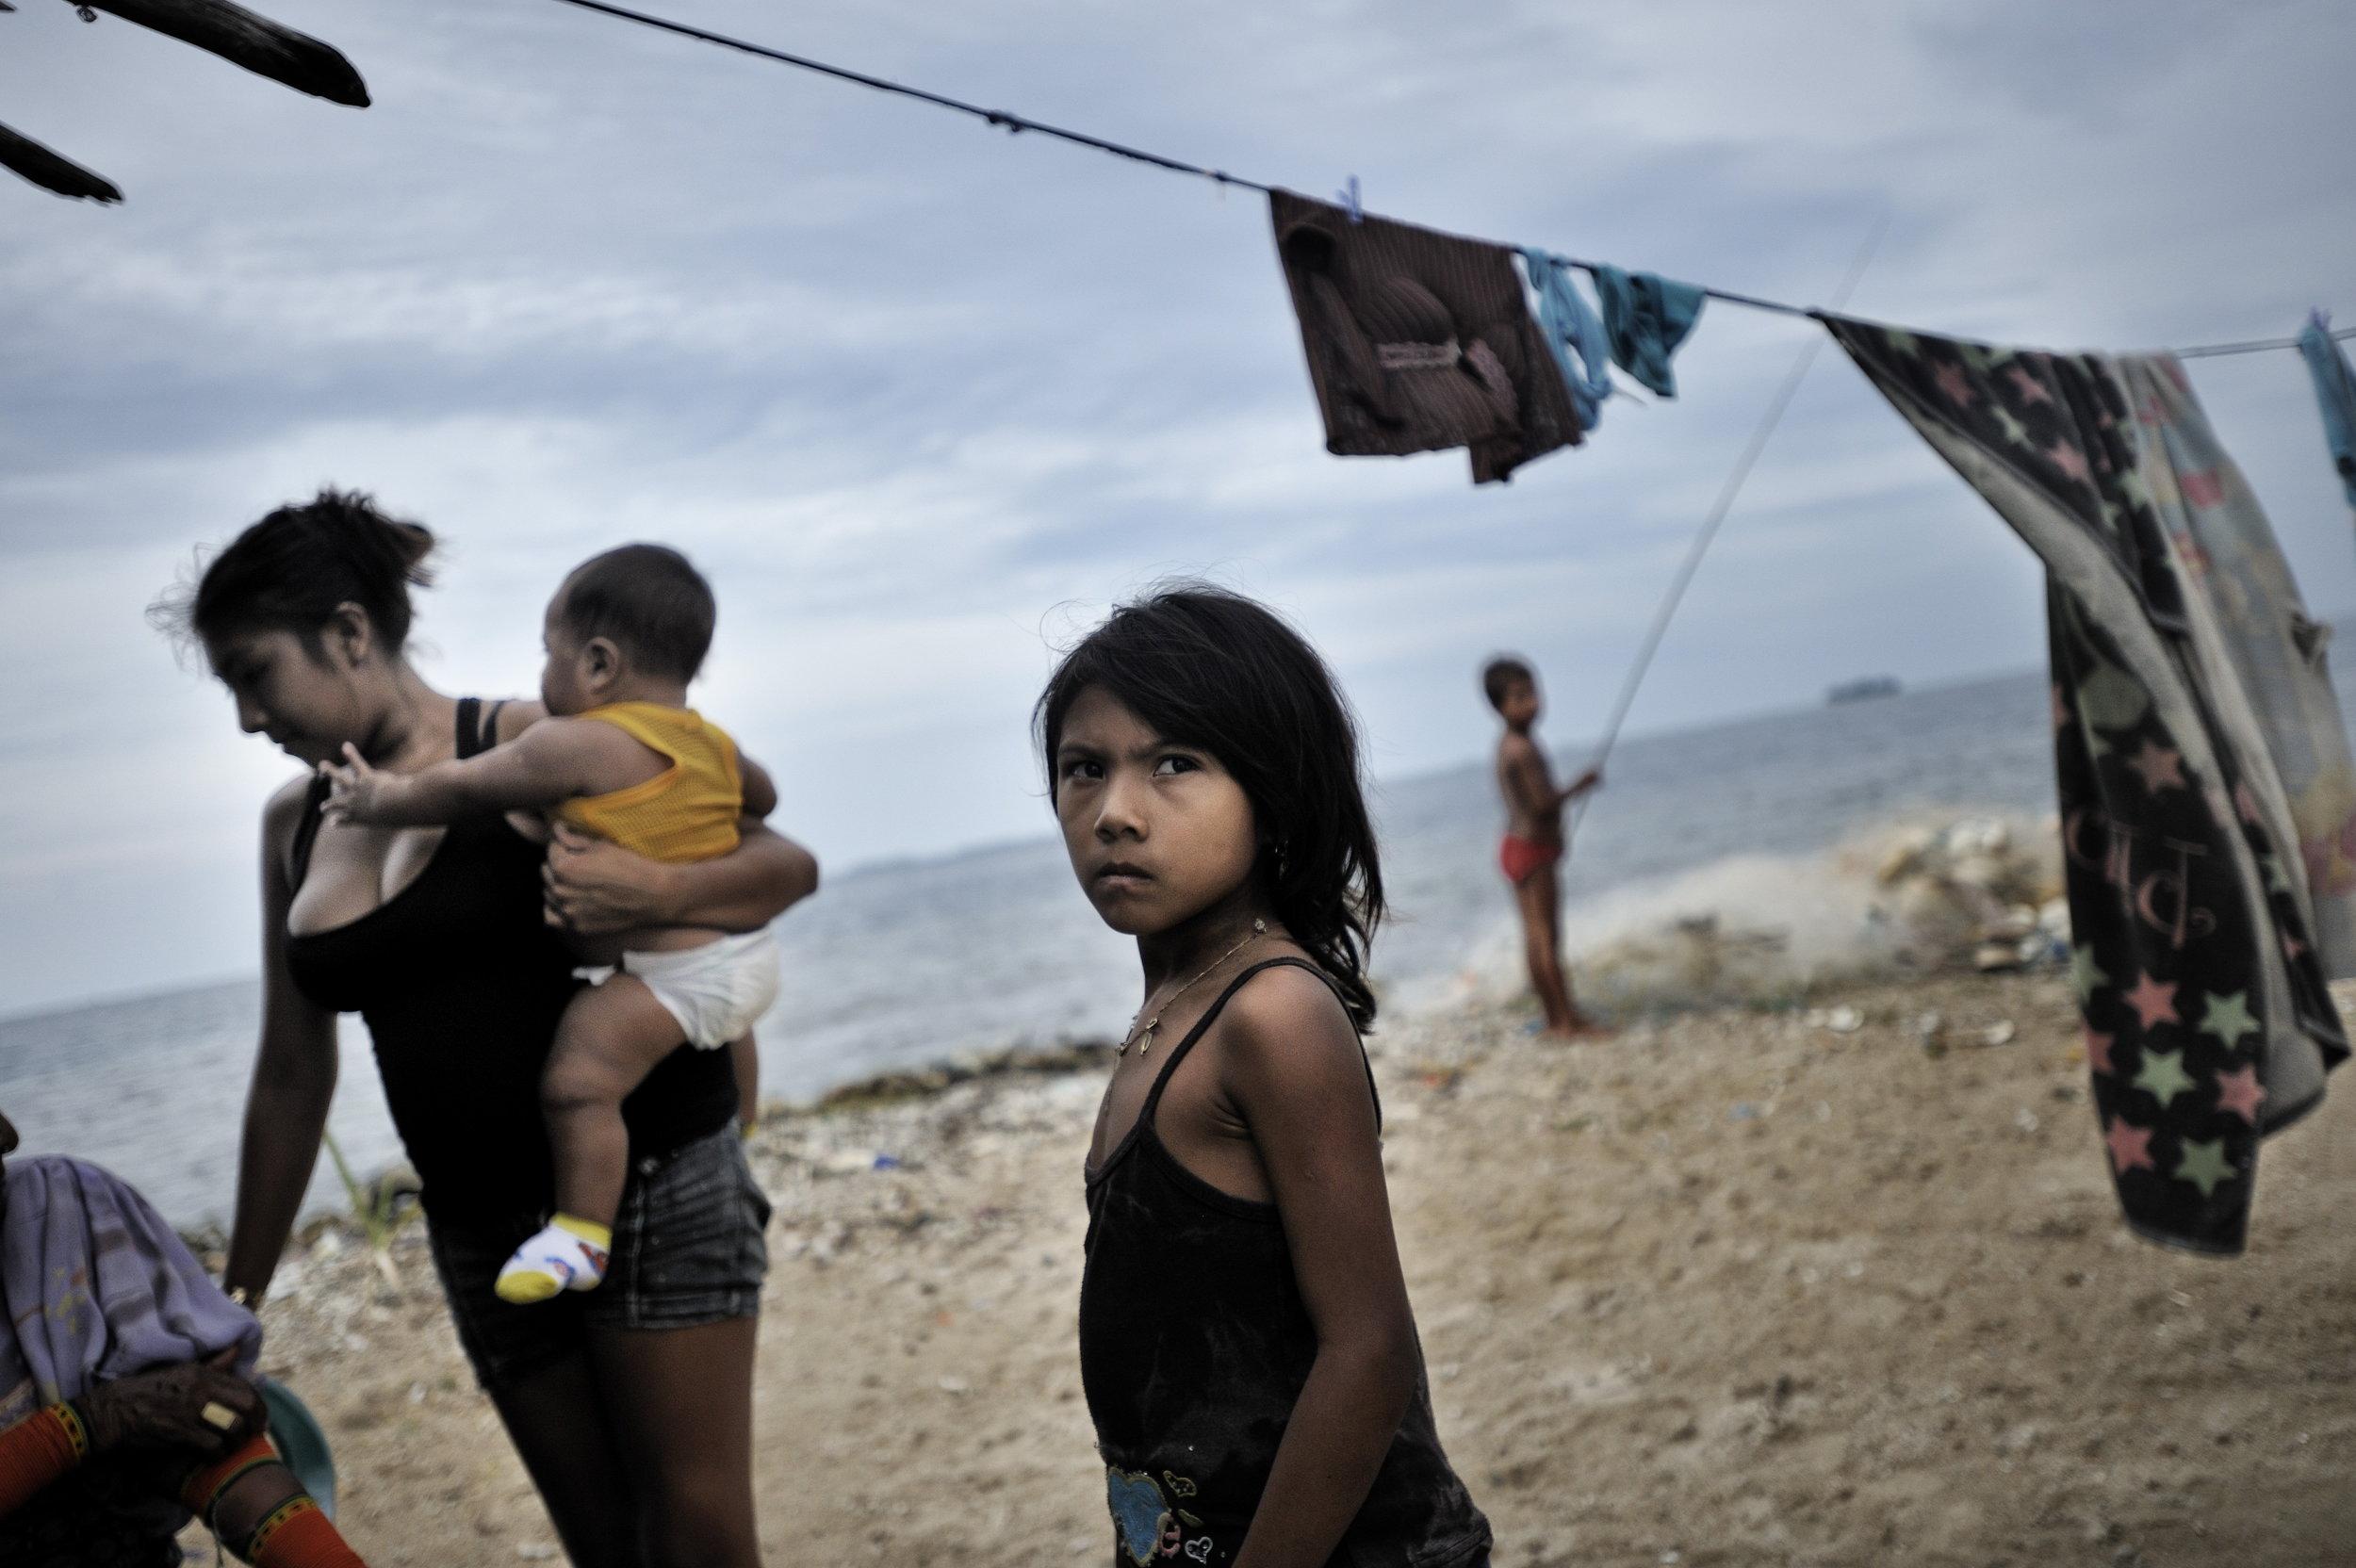 Via Panam, migration in the America's, Panama